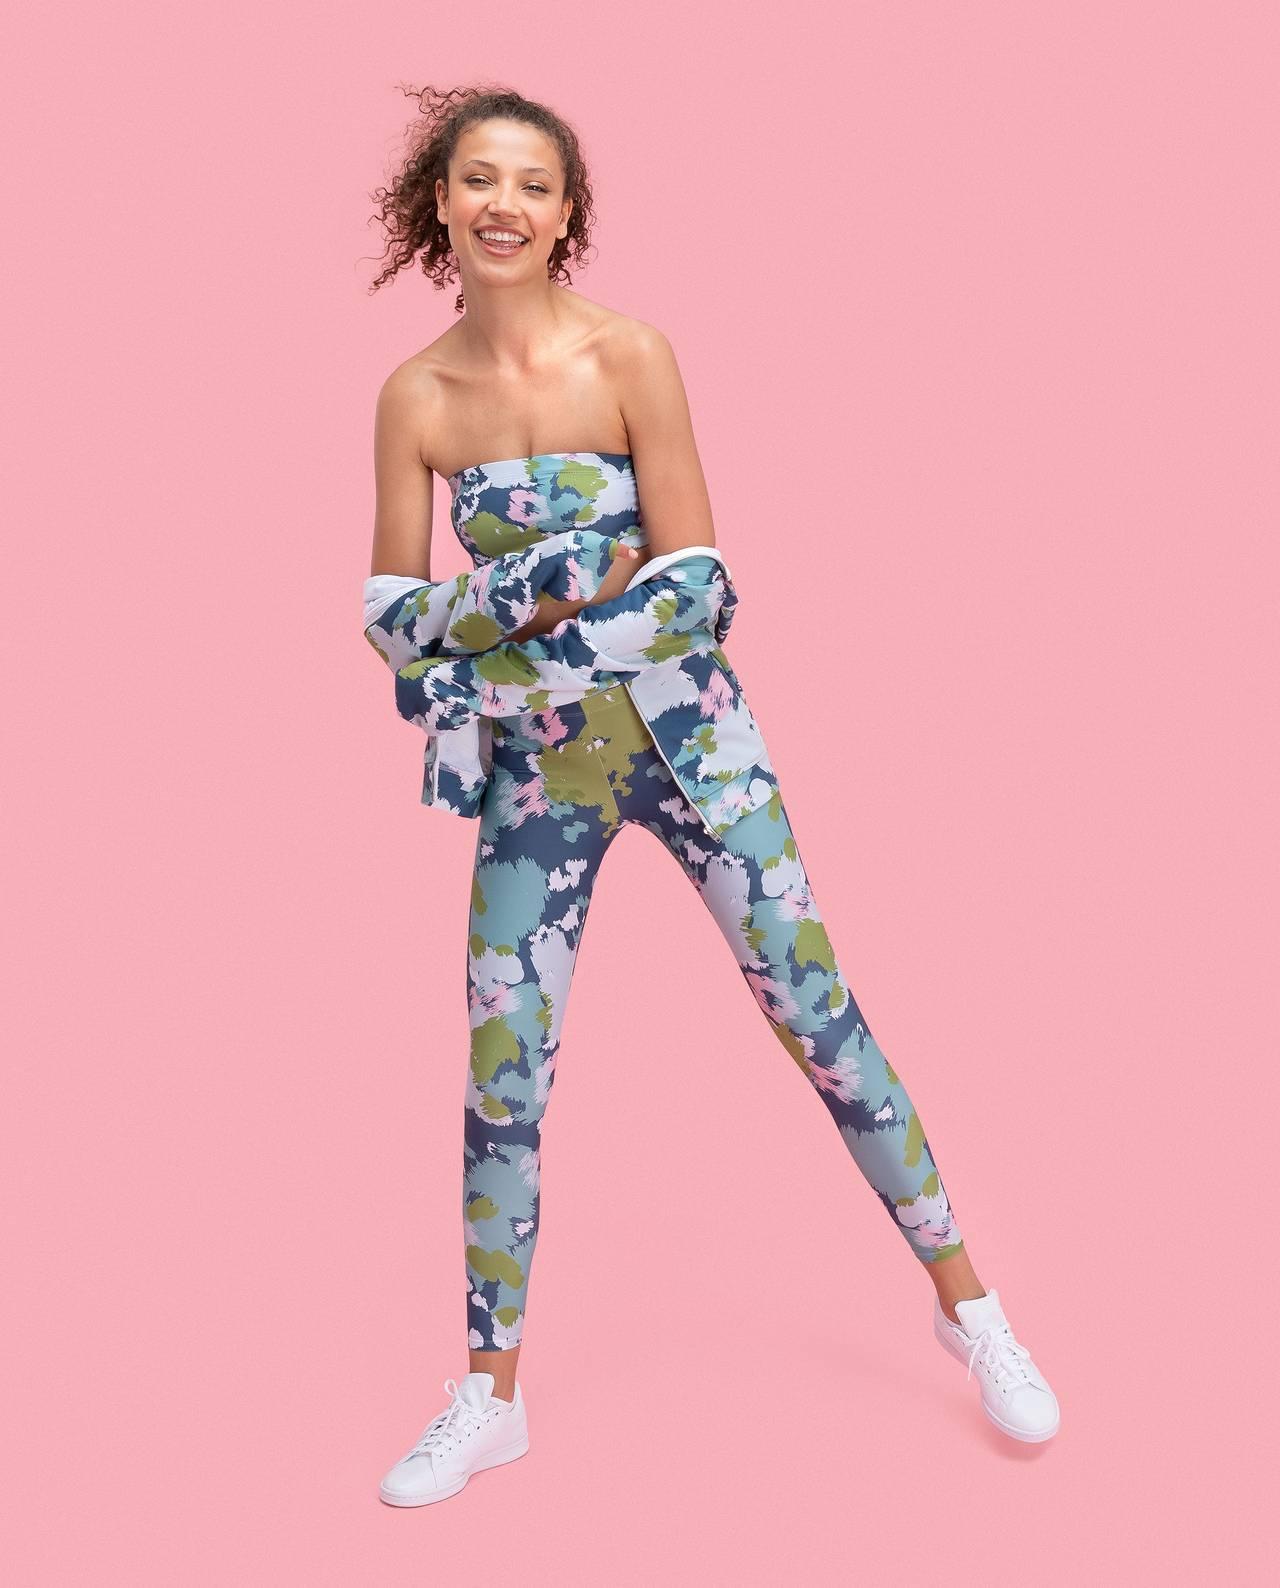 Damen Kleidung selbst designen